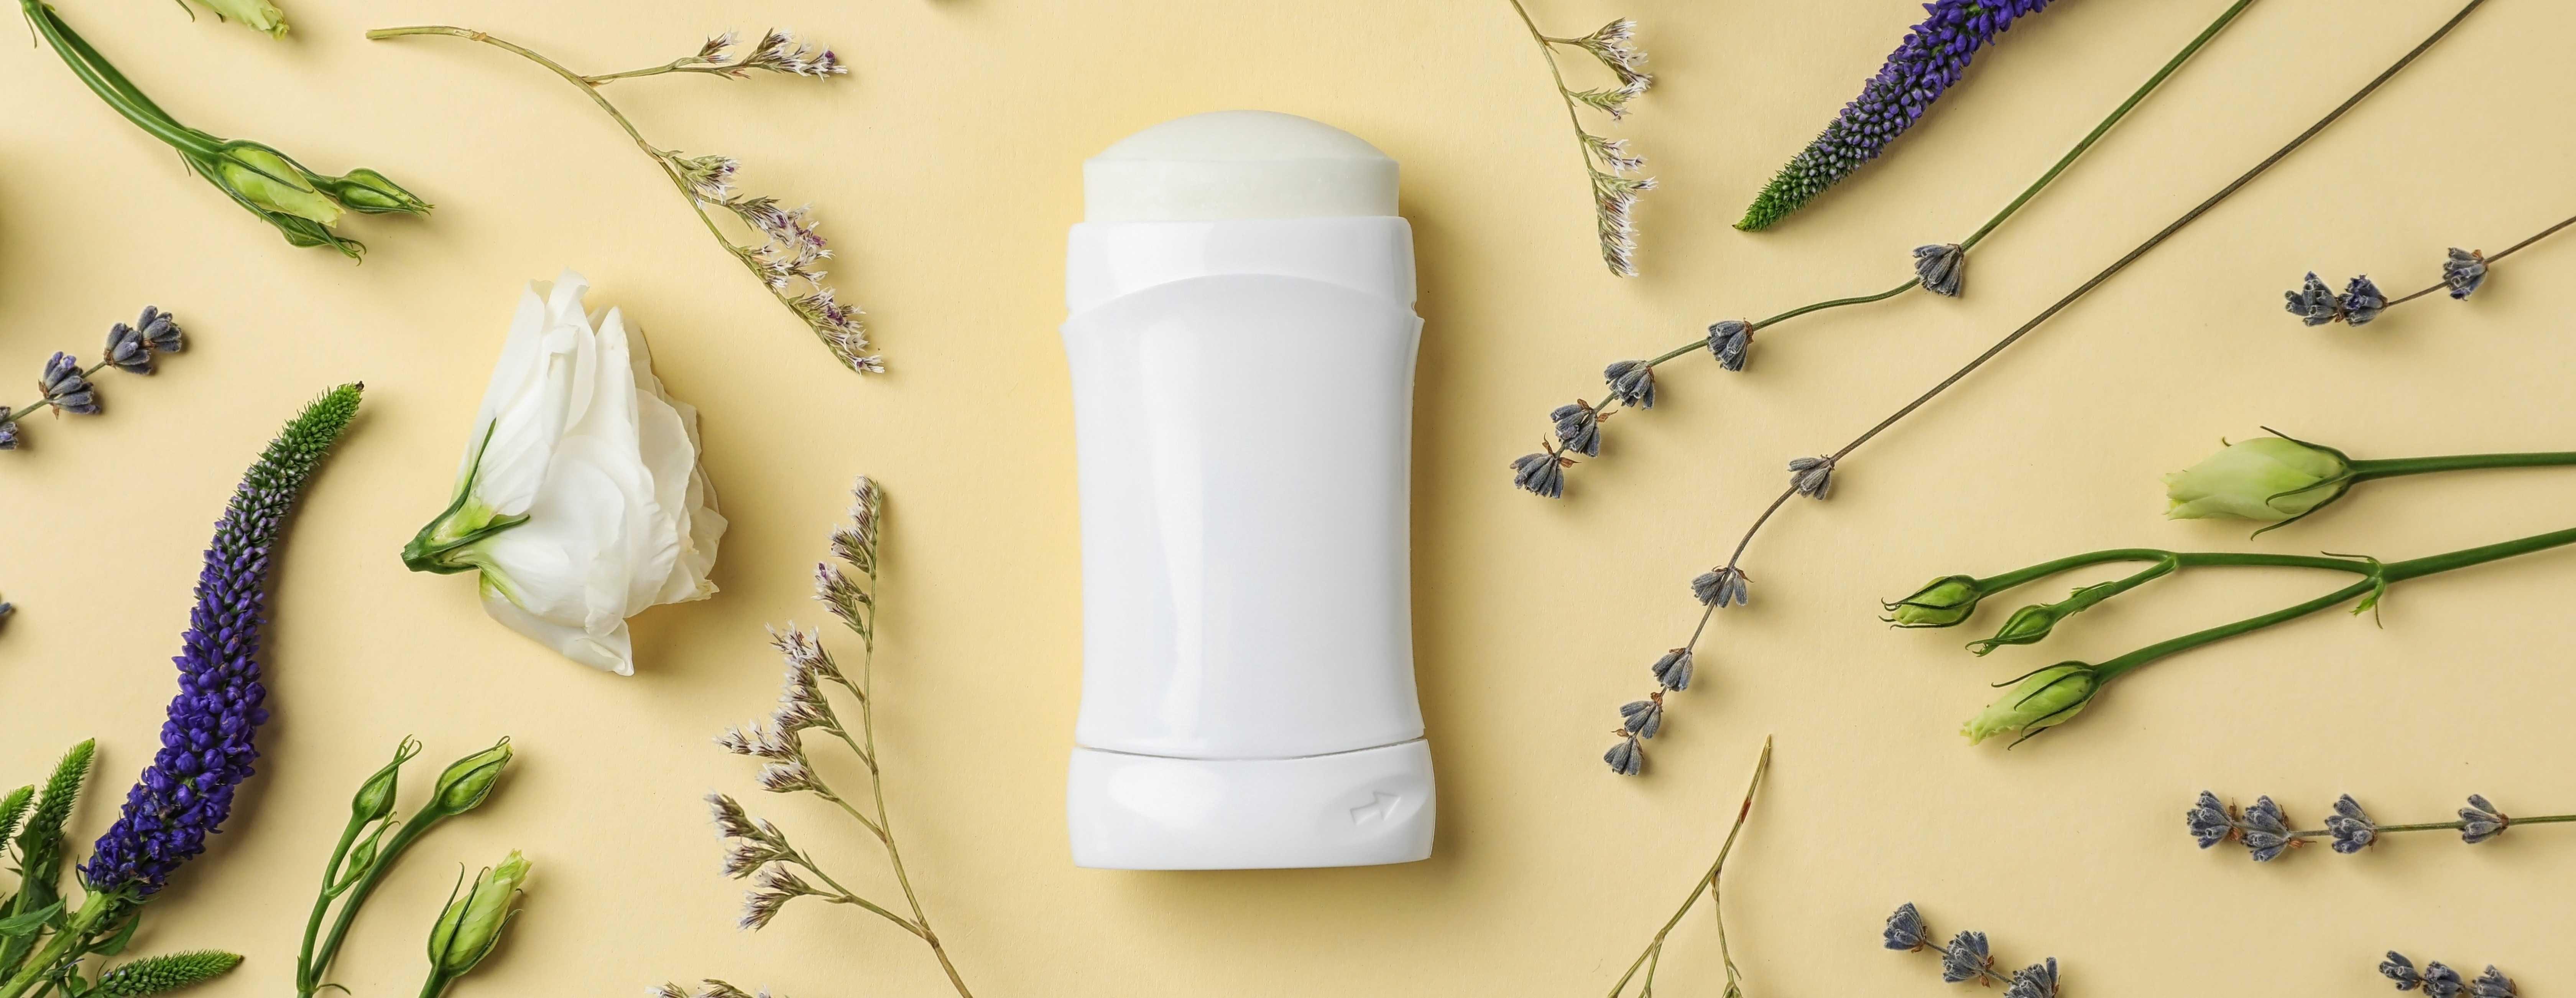 deodorant and flower flatlay - wide